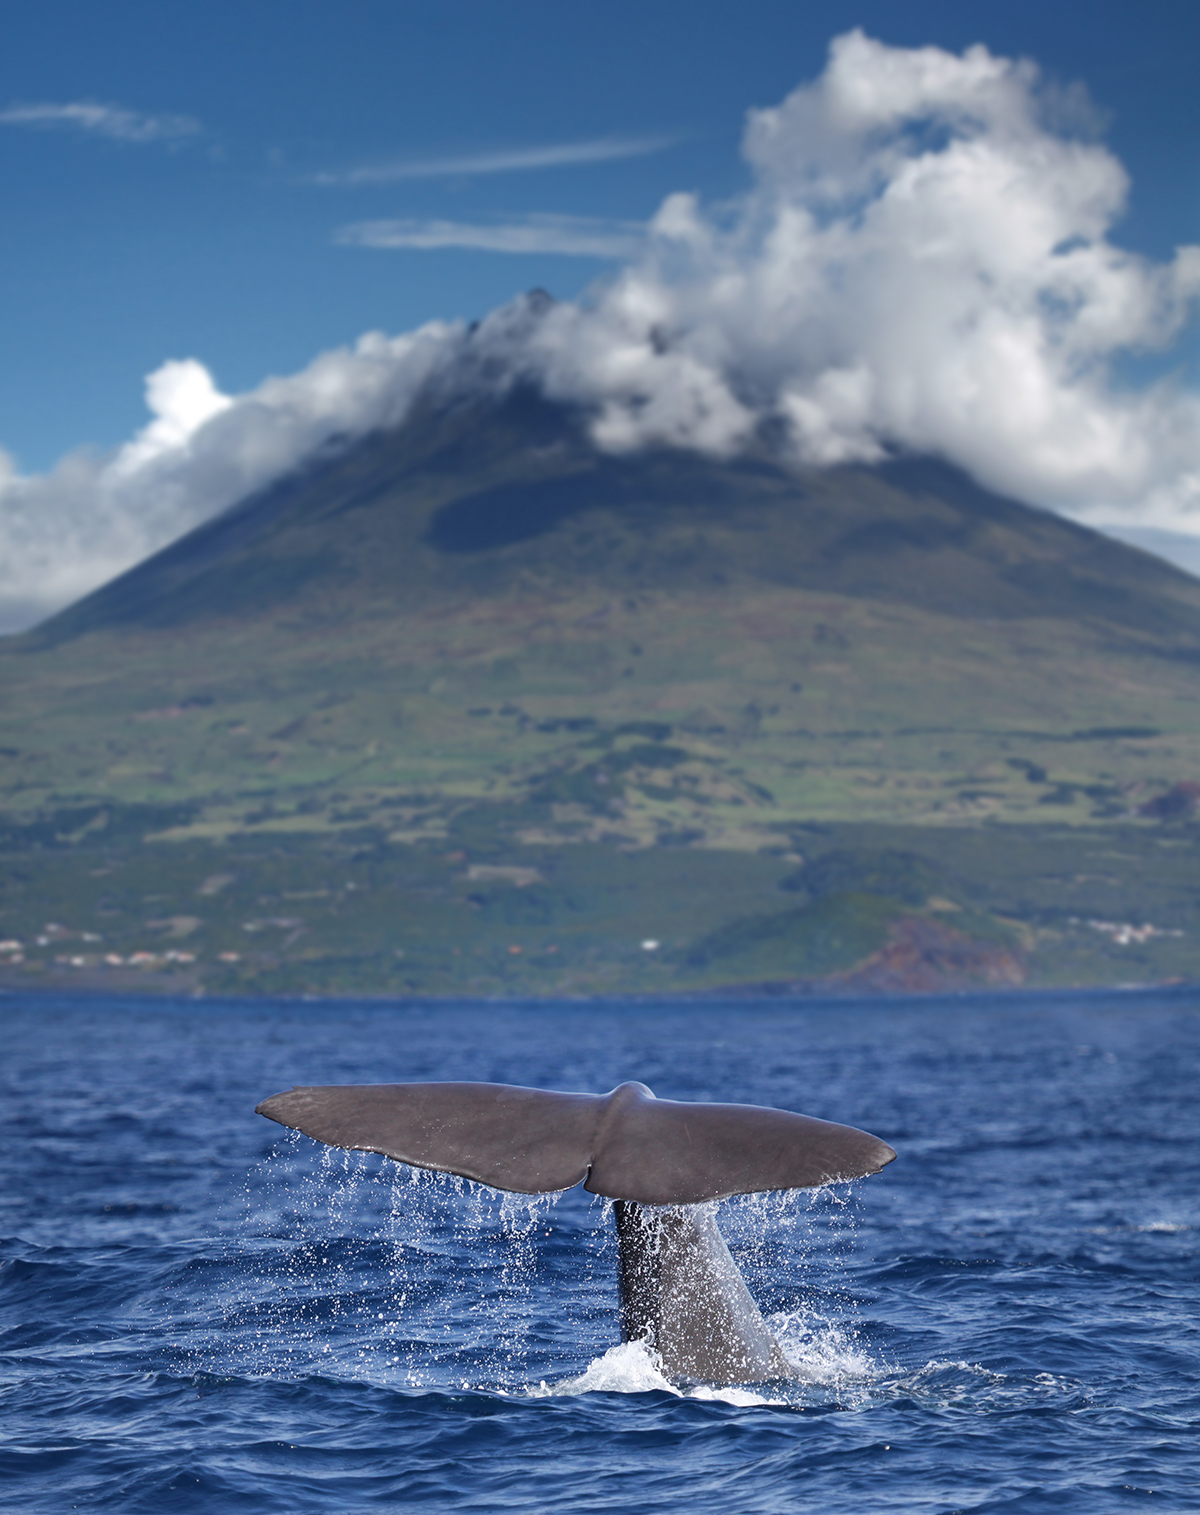 Sperm Whale Pico